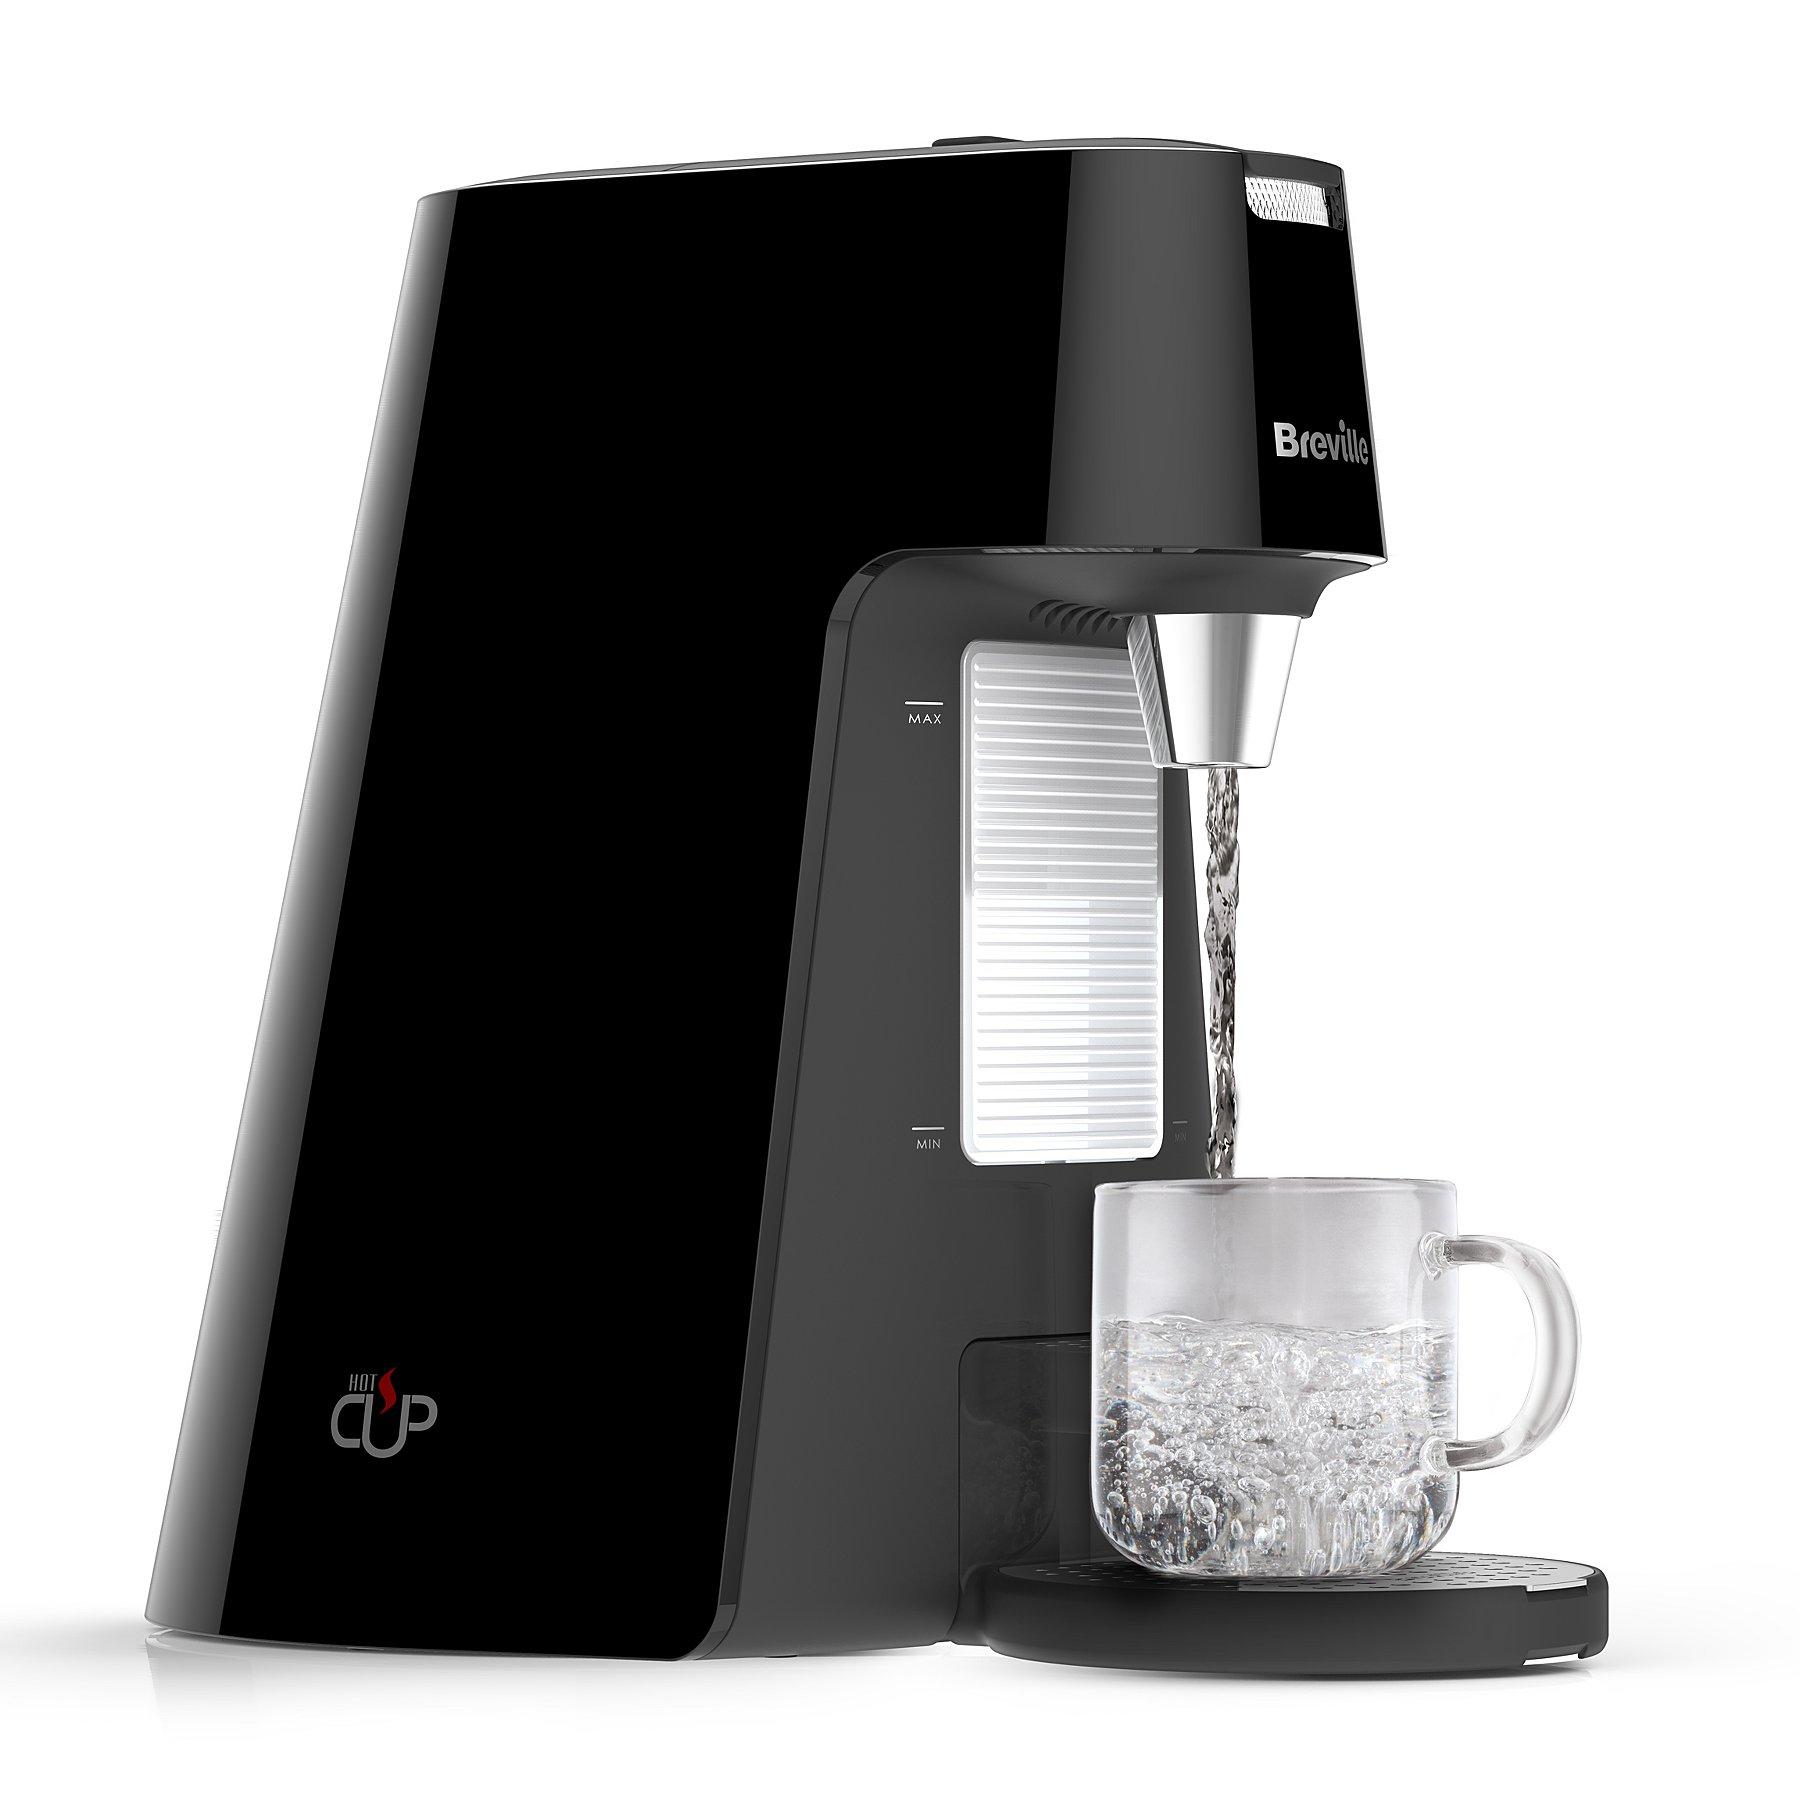 Breville VKT124 HotCup Hot Water Dispenser £27.48 @ Asda / George